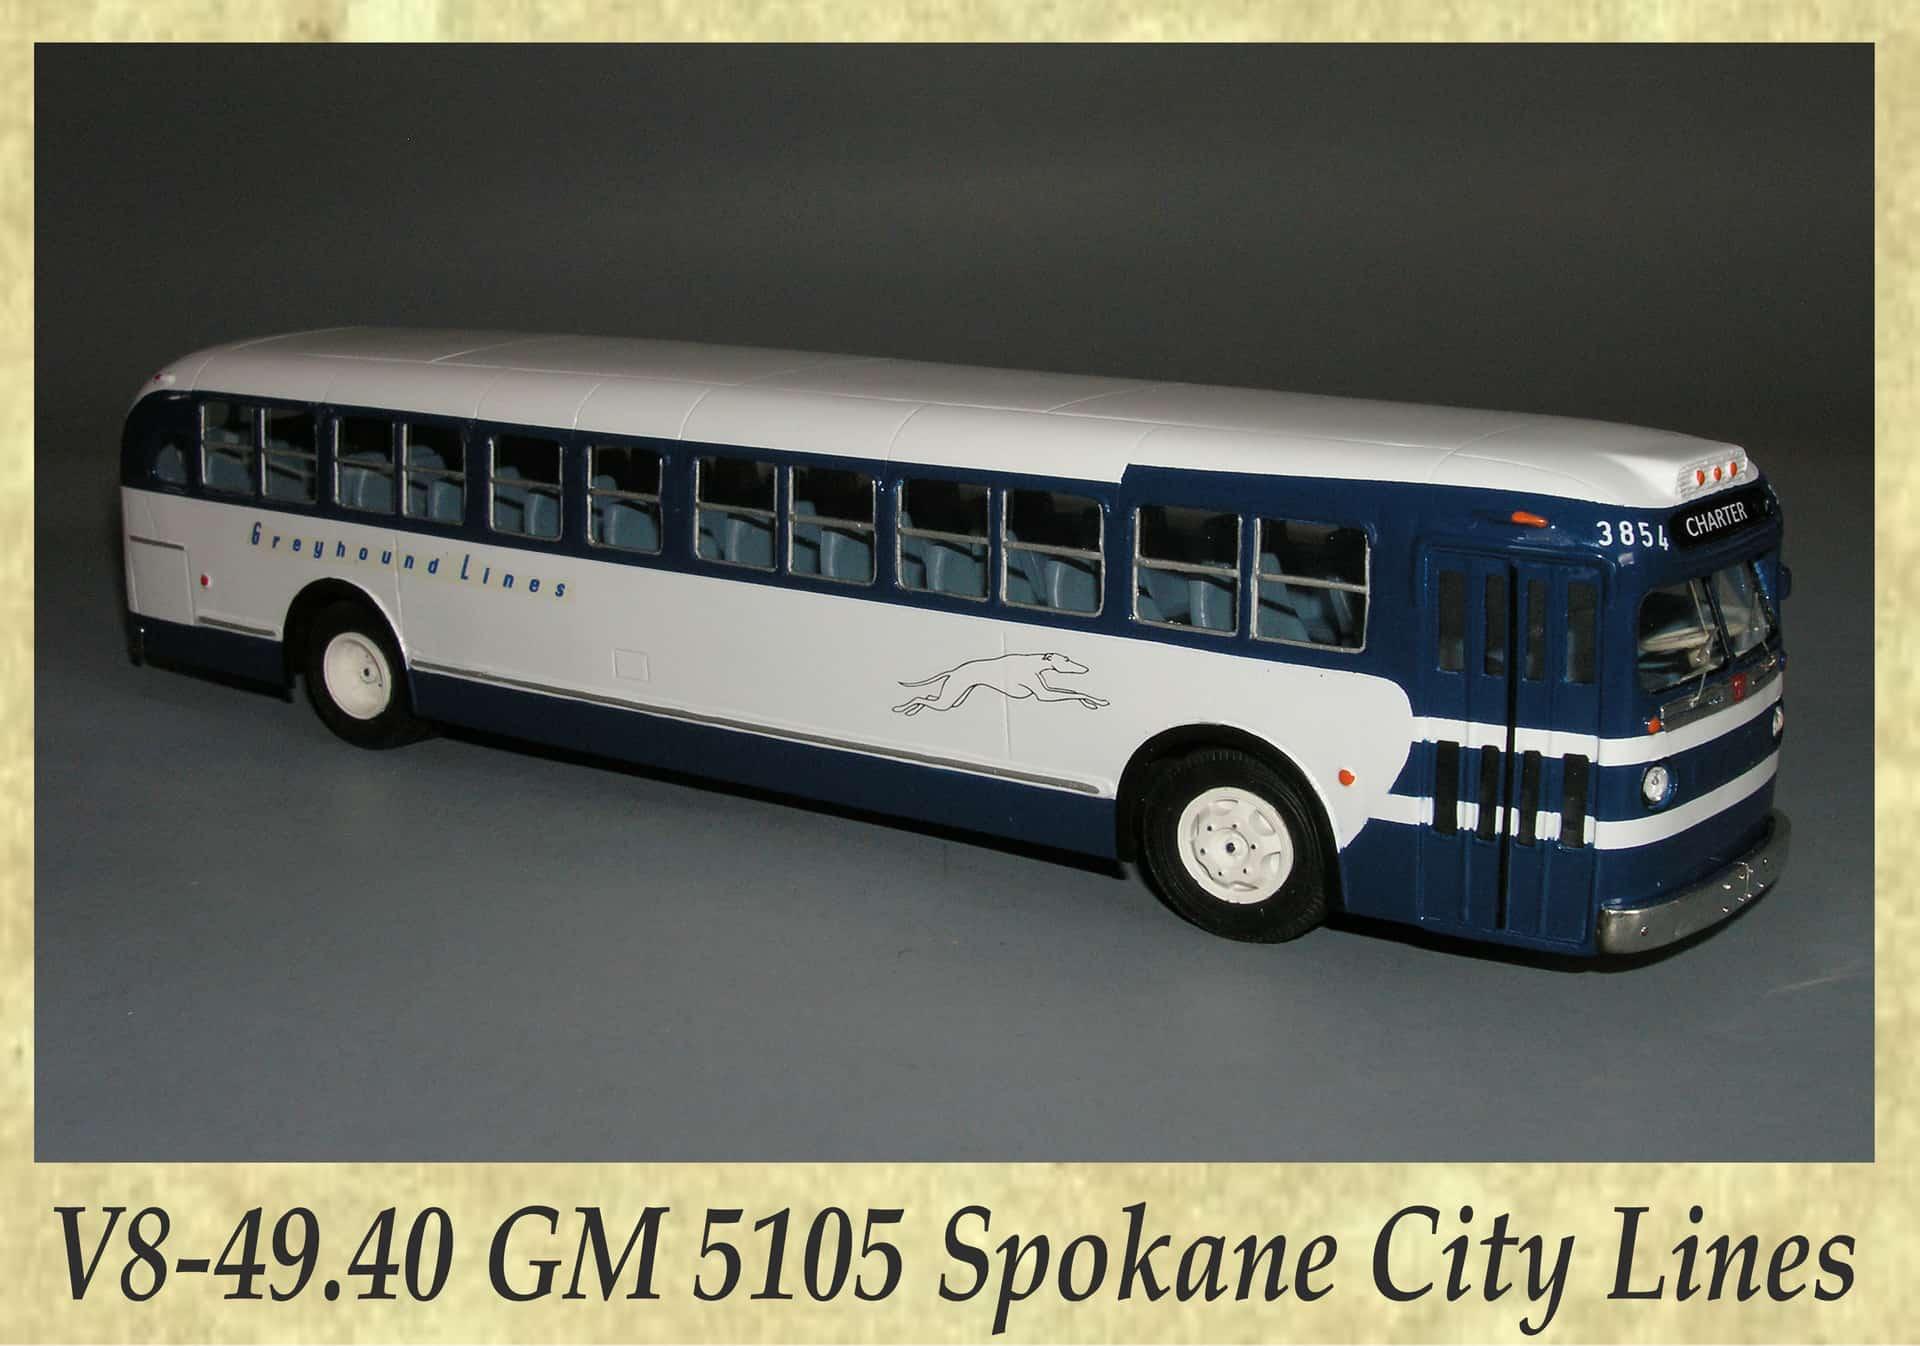 V8-49.40 GM 5105 Spokane City Lines